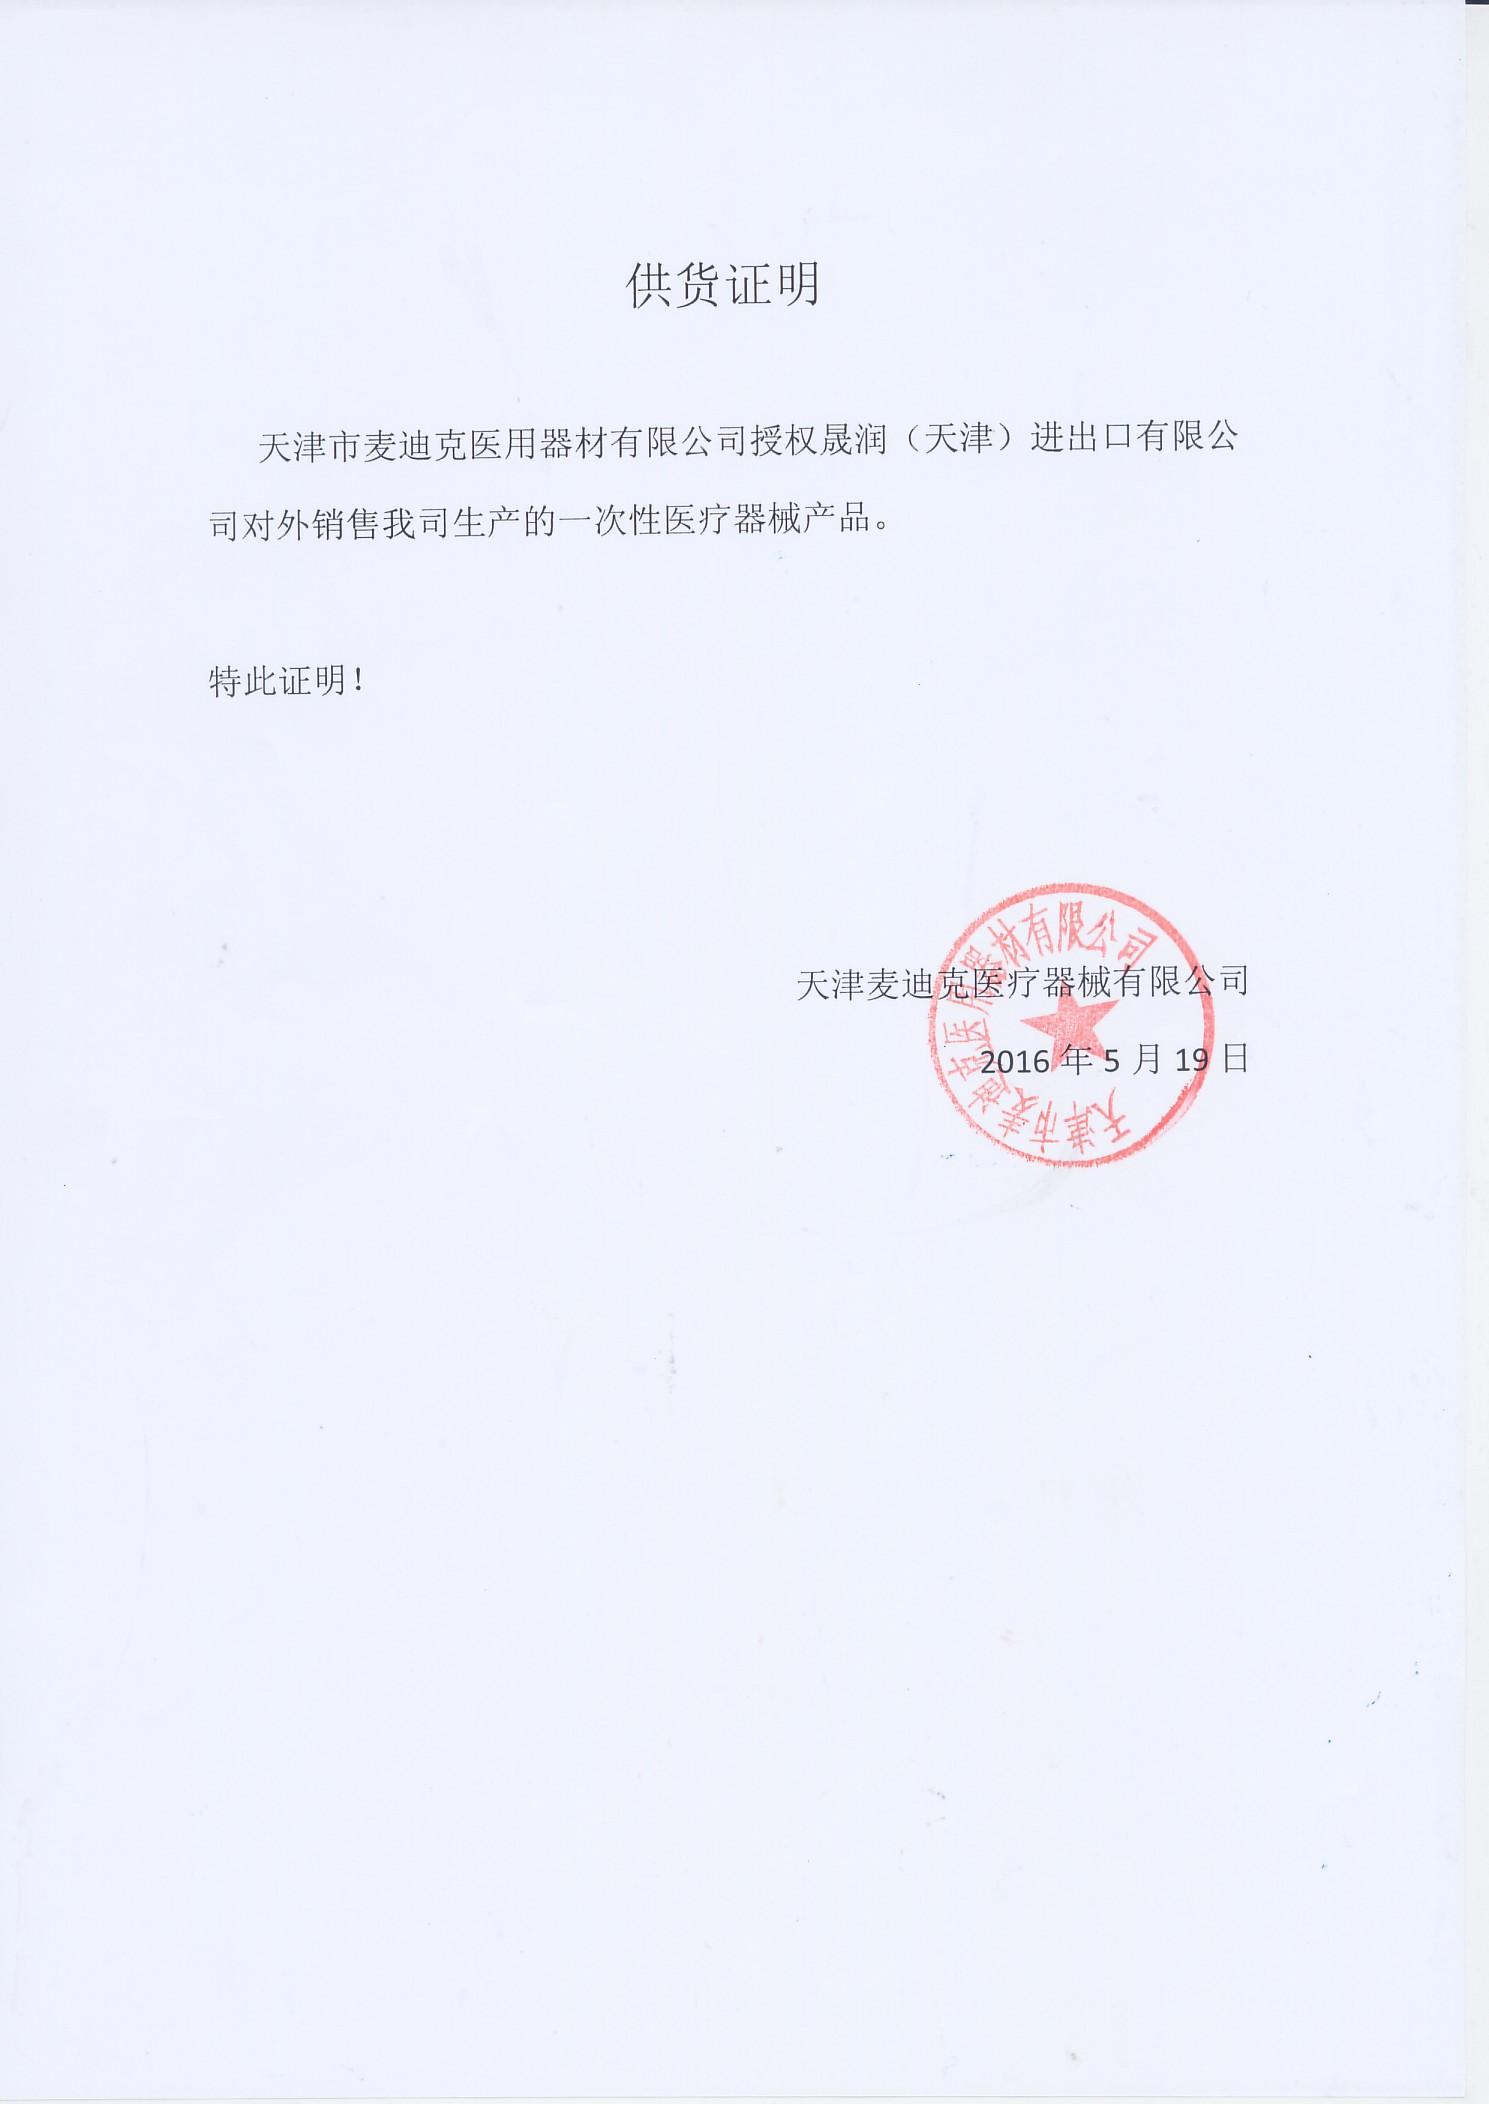 CFDA License-TJ20100024